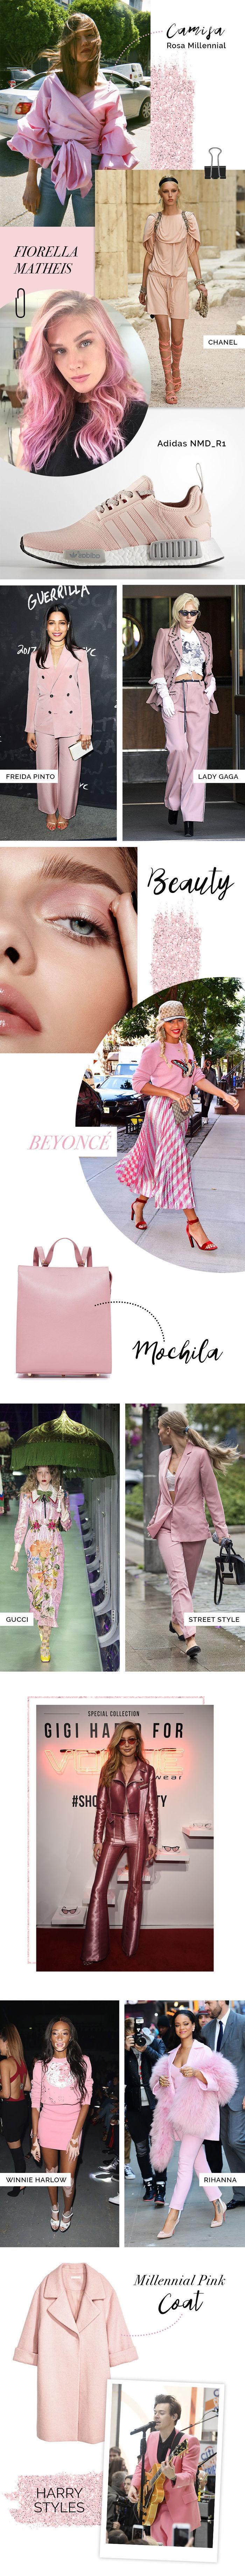 Layla Monteiro look rosa millennial rosa seco trendy color rosinha rosa blush Rihanna Harry Styles Lady Gaga